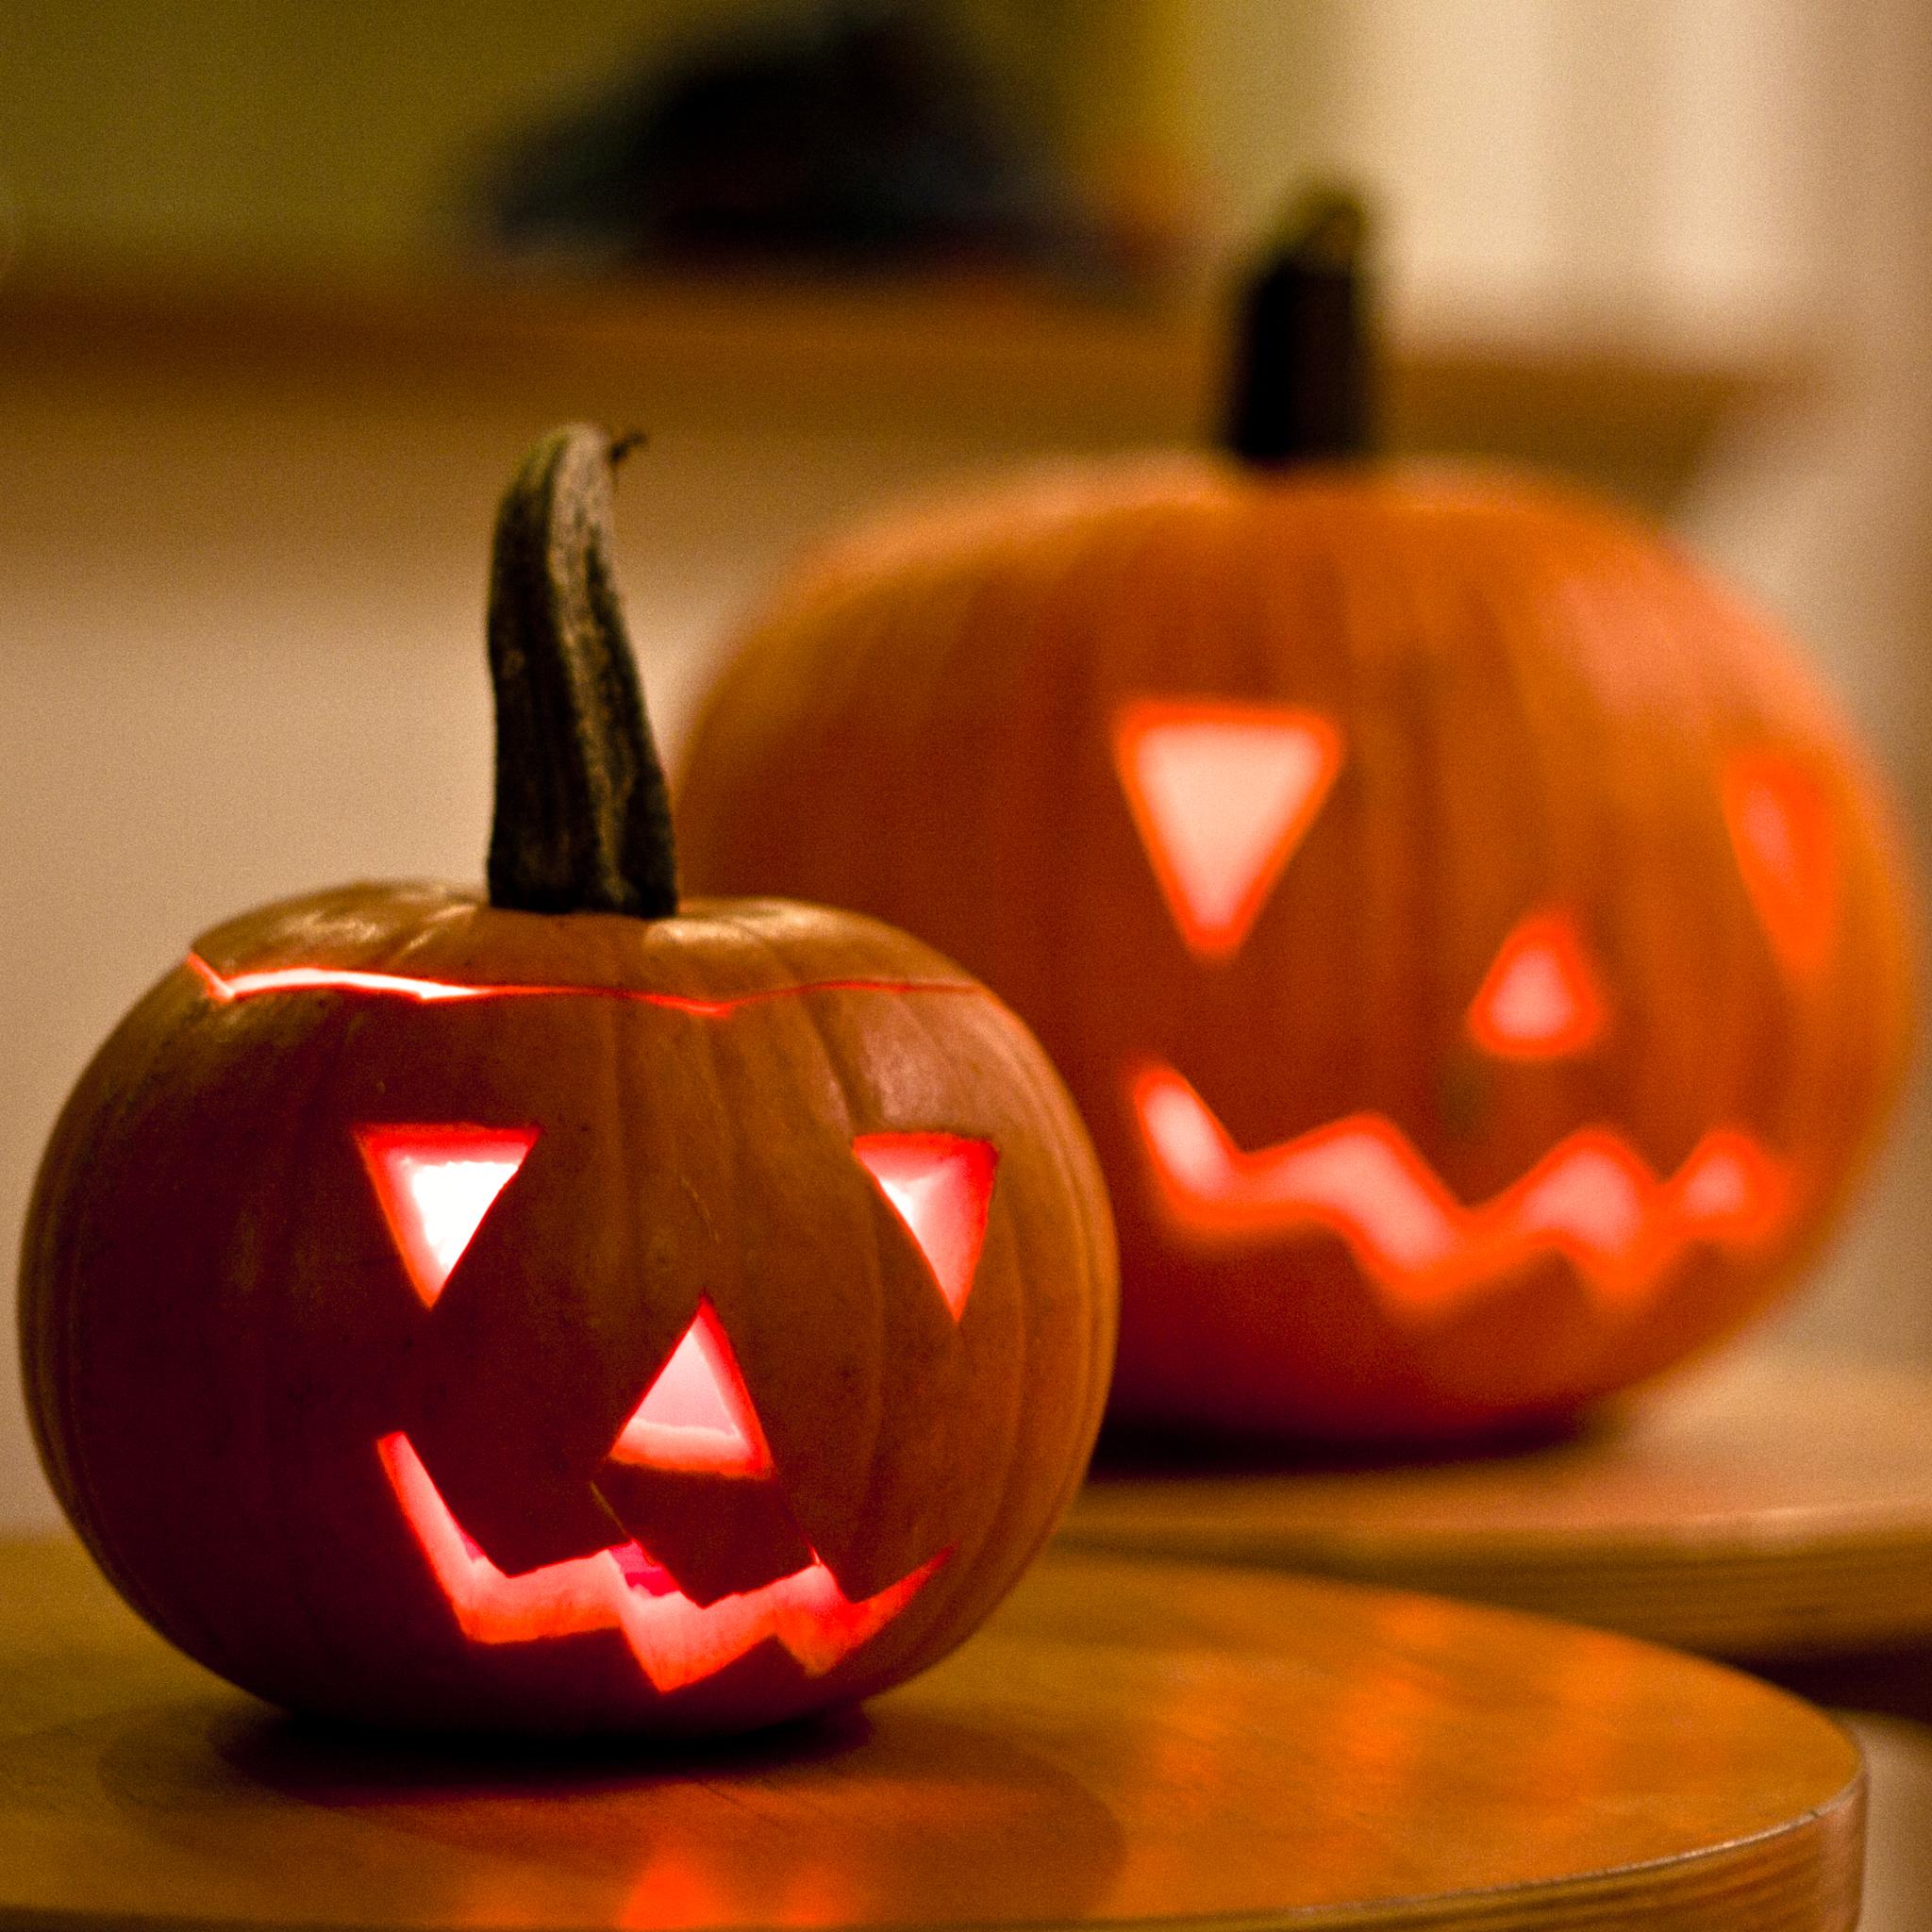 Halloween Pumpkins 3Wallpapers iPad Retina Halloween Pumpkins   iPad Retina